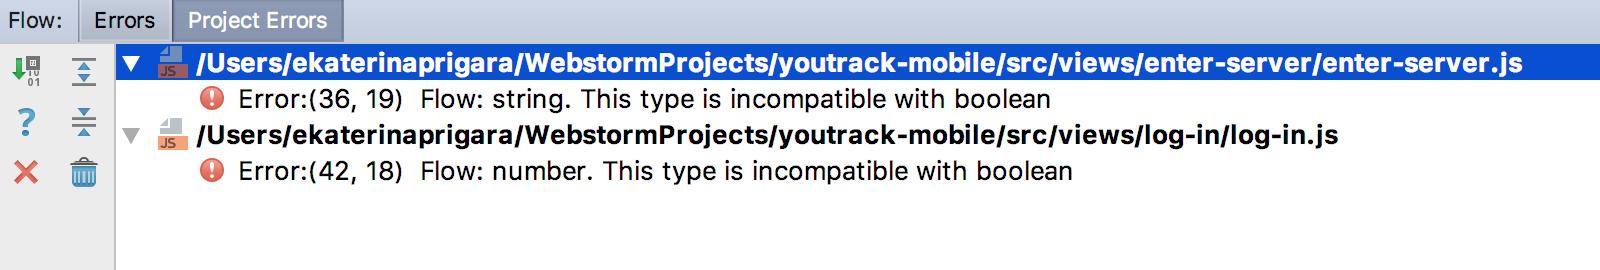 flow-project-errors